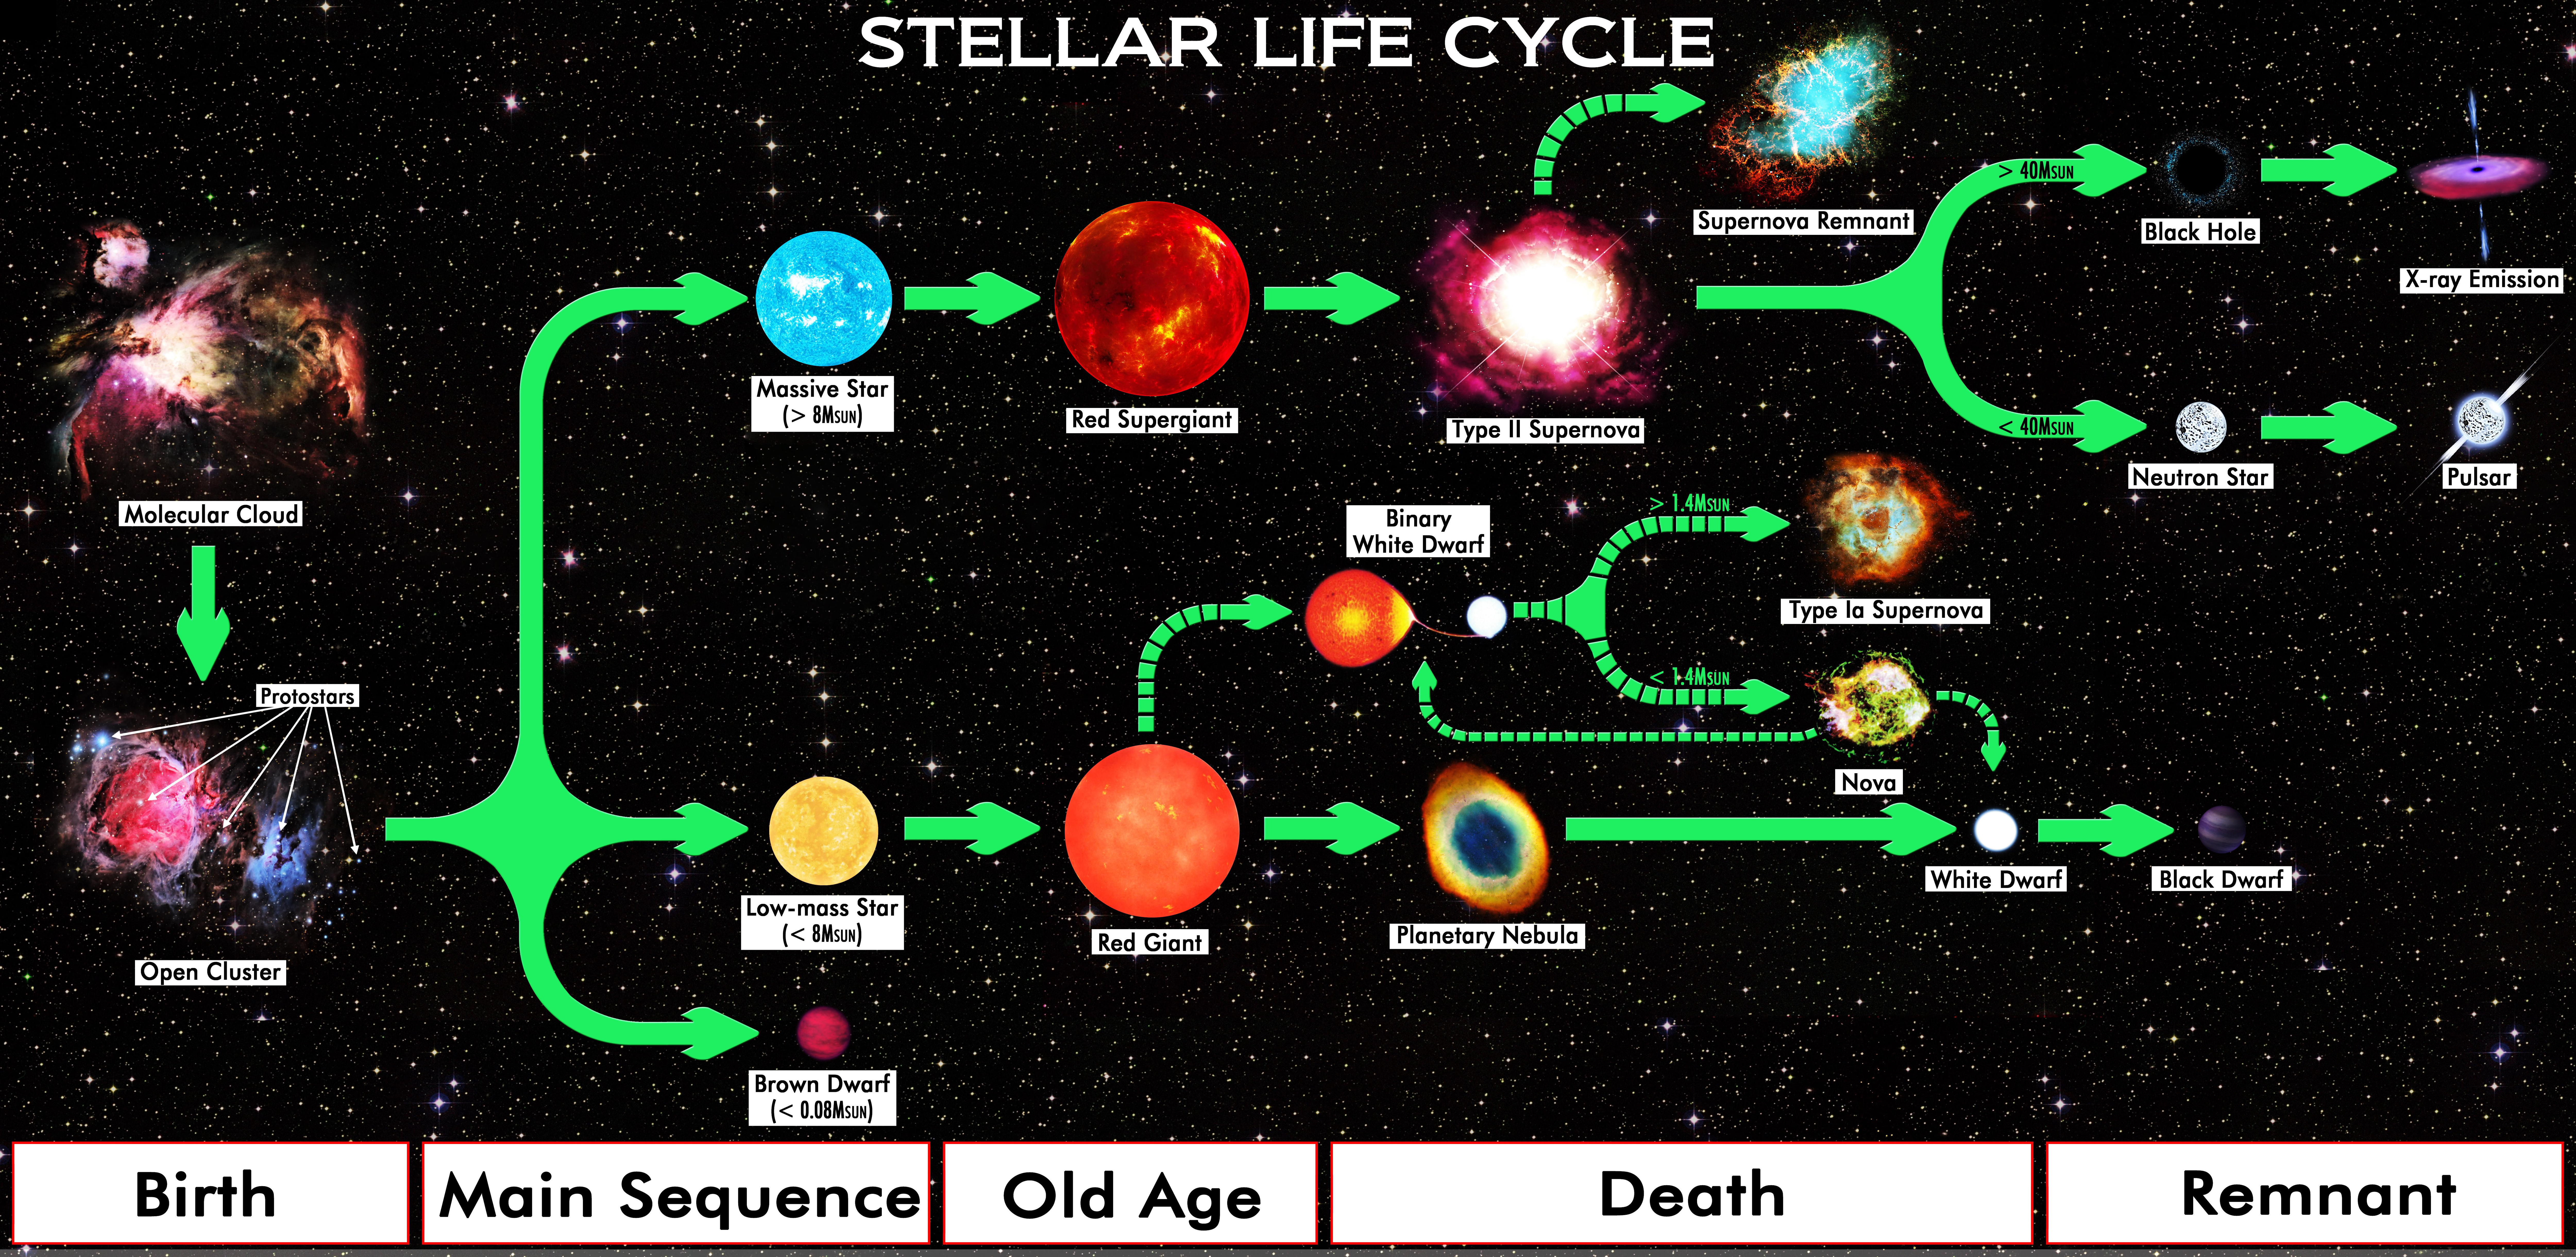 Filestar life cycle chartg wikimedia commons filestar life cycle chartg nvjuhfo Image collections